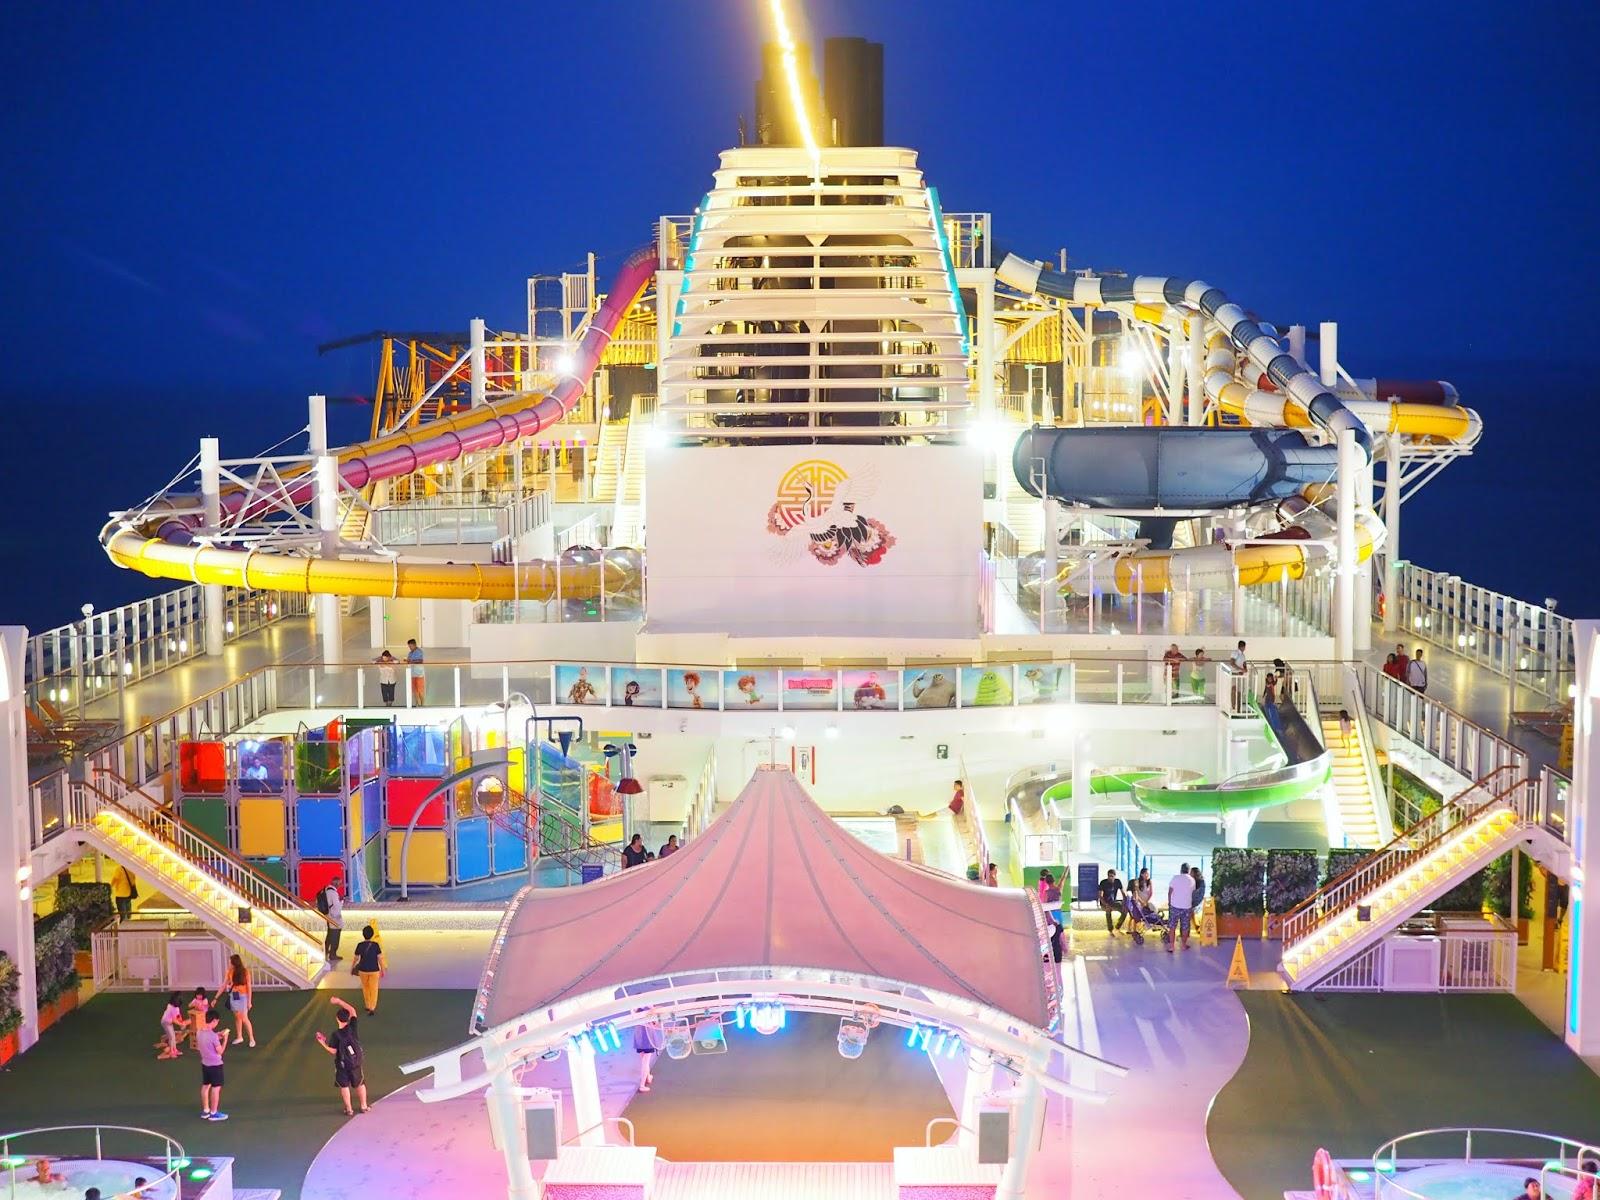 Mr Doctor S Speaking Genting Dream Cruise 4 Days 3 Nights Sail To Phuket